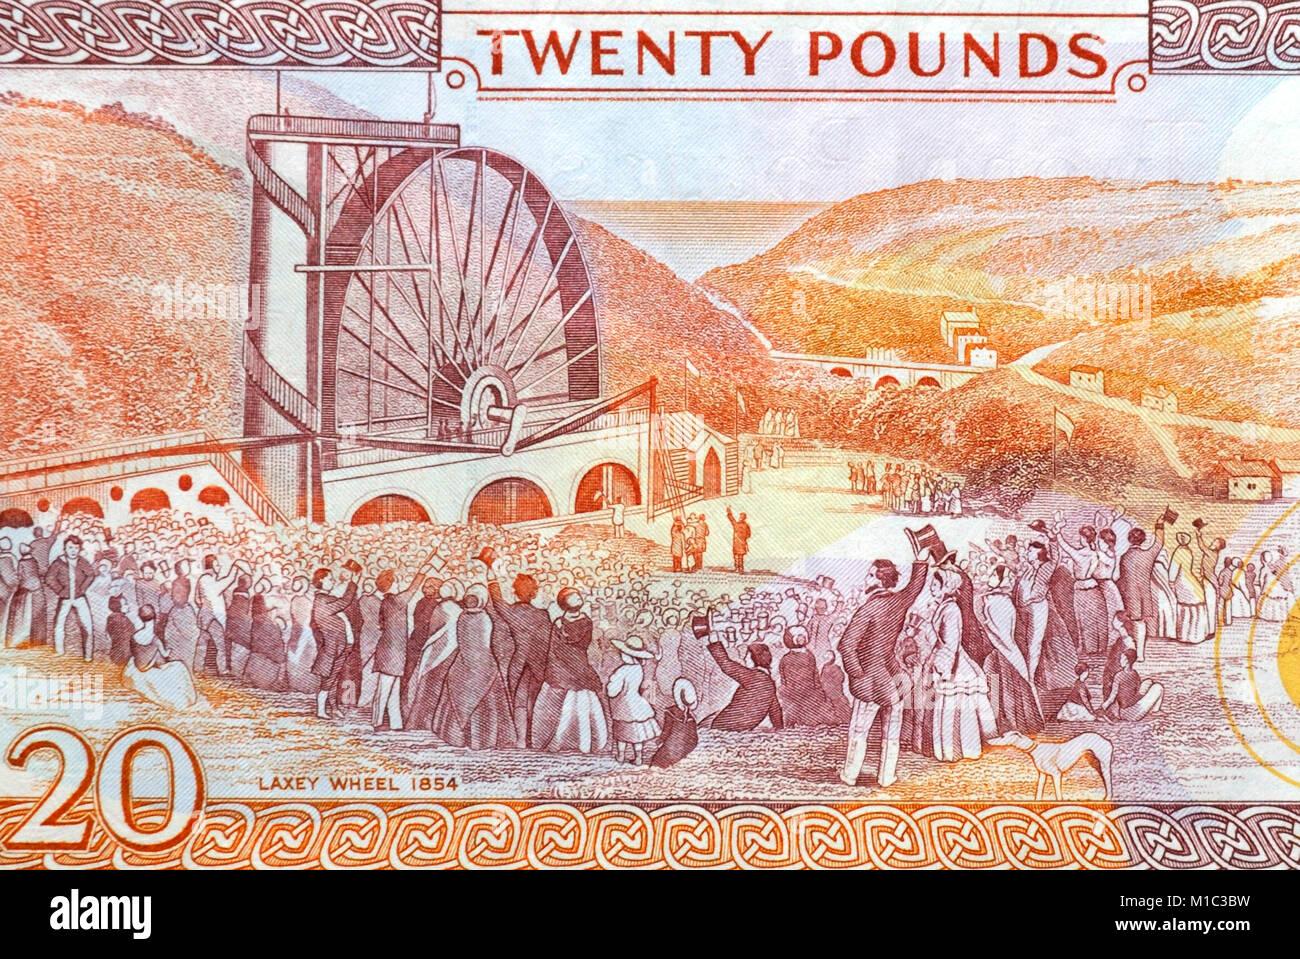 Isle of Man Twenty 20 Pounds Bank Note Stock Photo